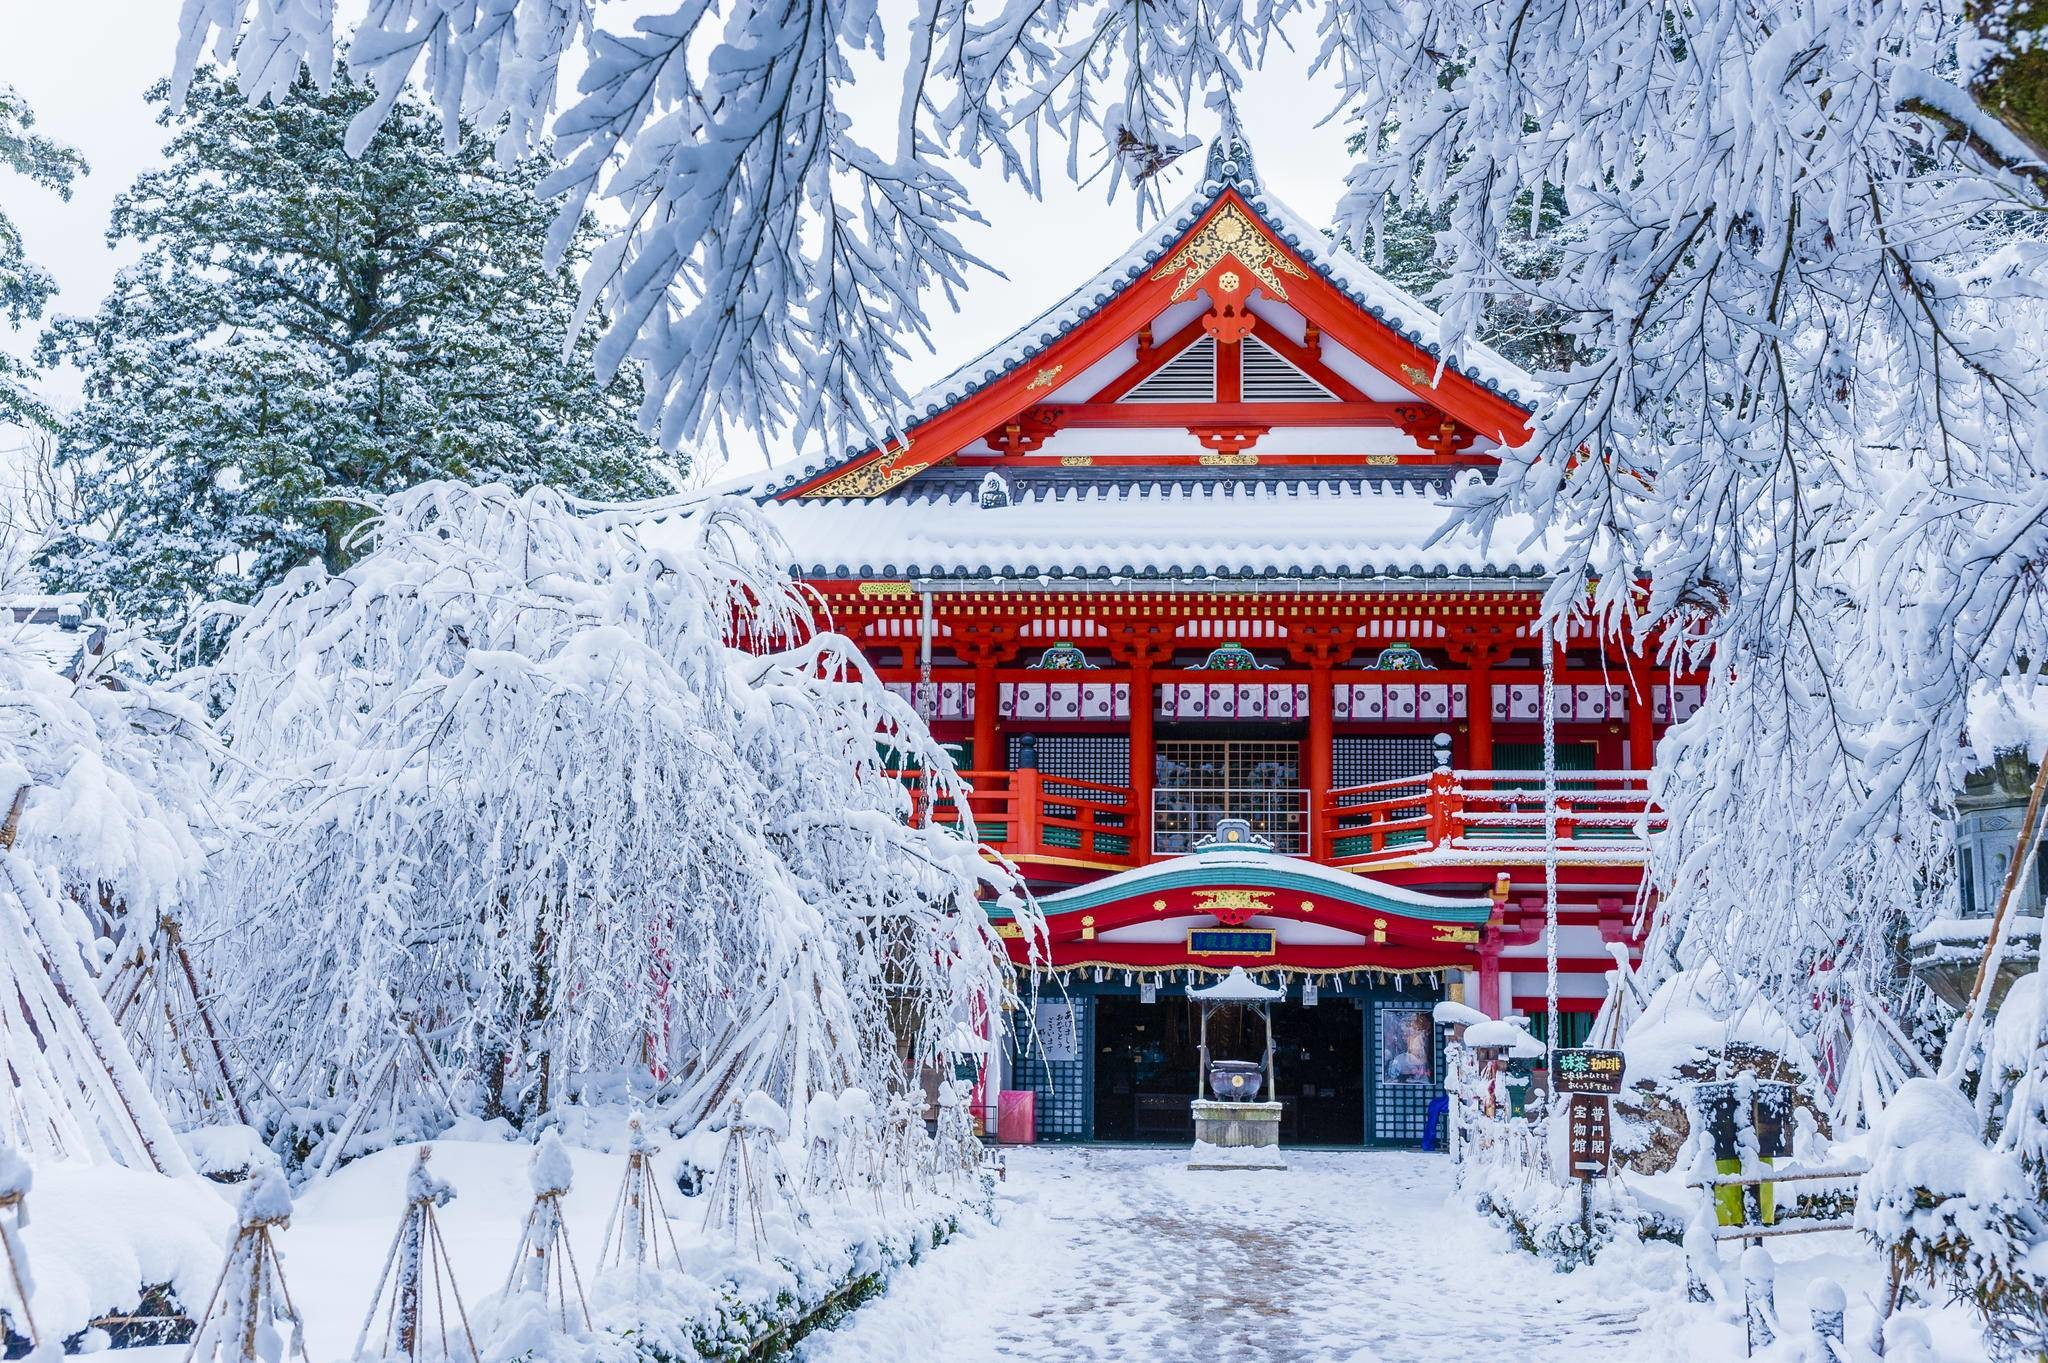 GRP-ASIA-WINTER JAPAN SKI RESORT THEME PARK+TUNNEL OF LIGHT ILLUMINATION  JAN-MAR'17 BY CX